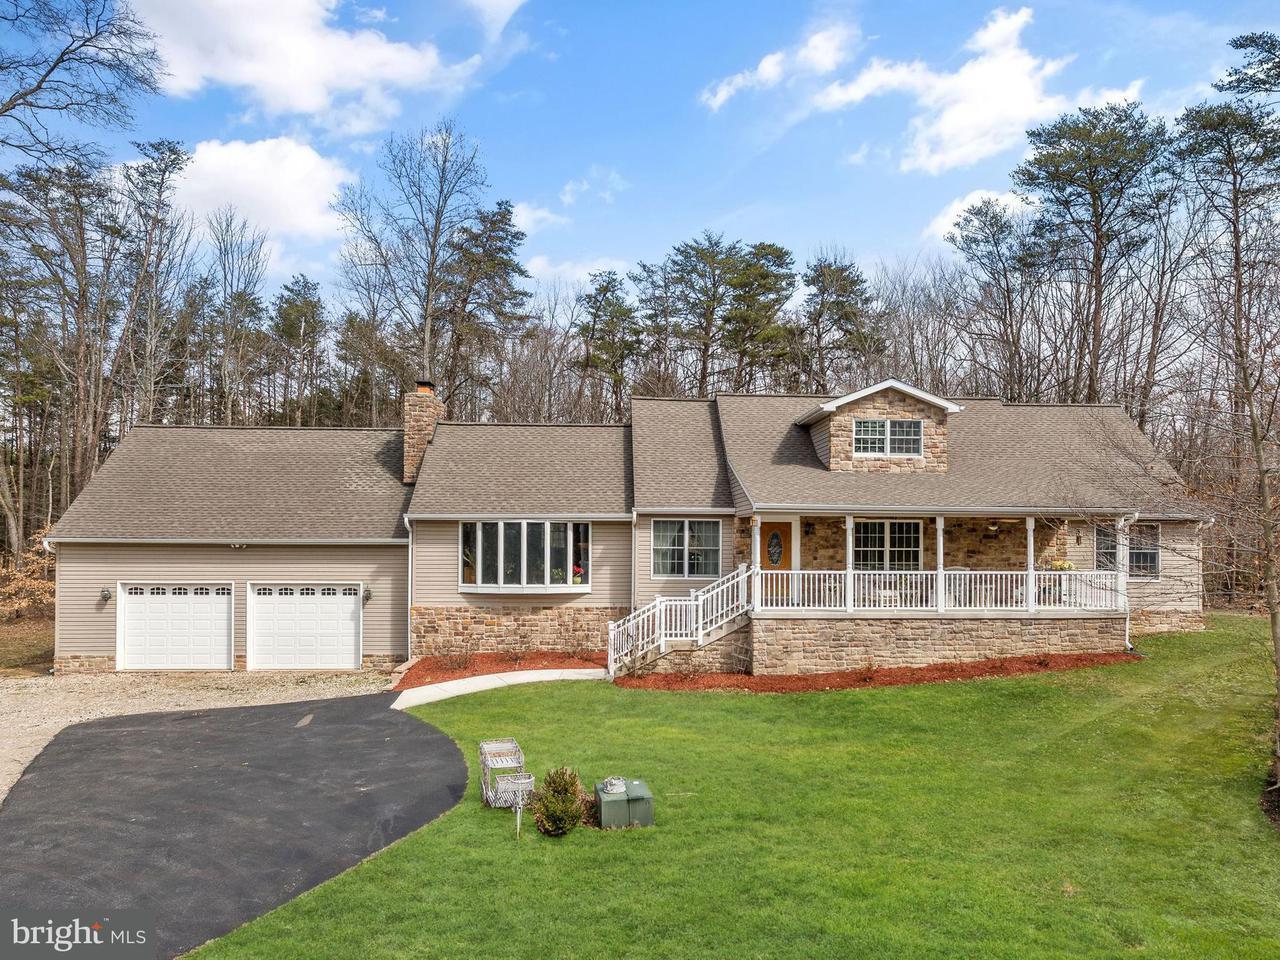 獨棟家庭住宅 為 出售 在 2966 Conway Road 2966 Conway Road Odenton, 馬里蘭州 21113 美國